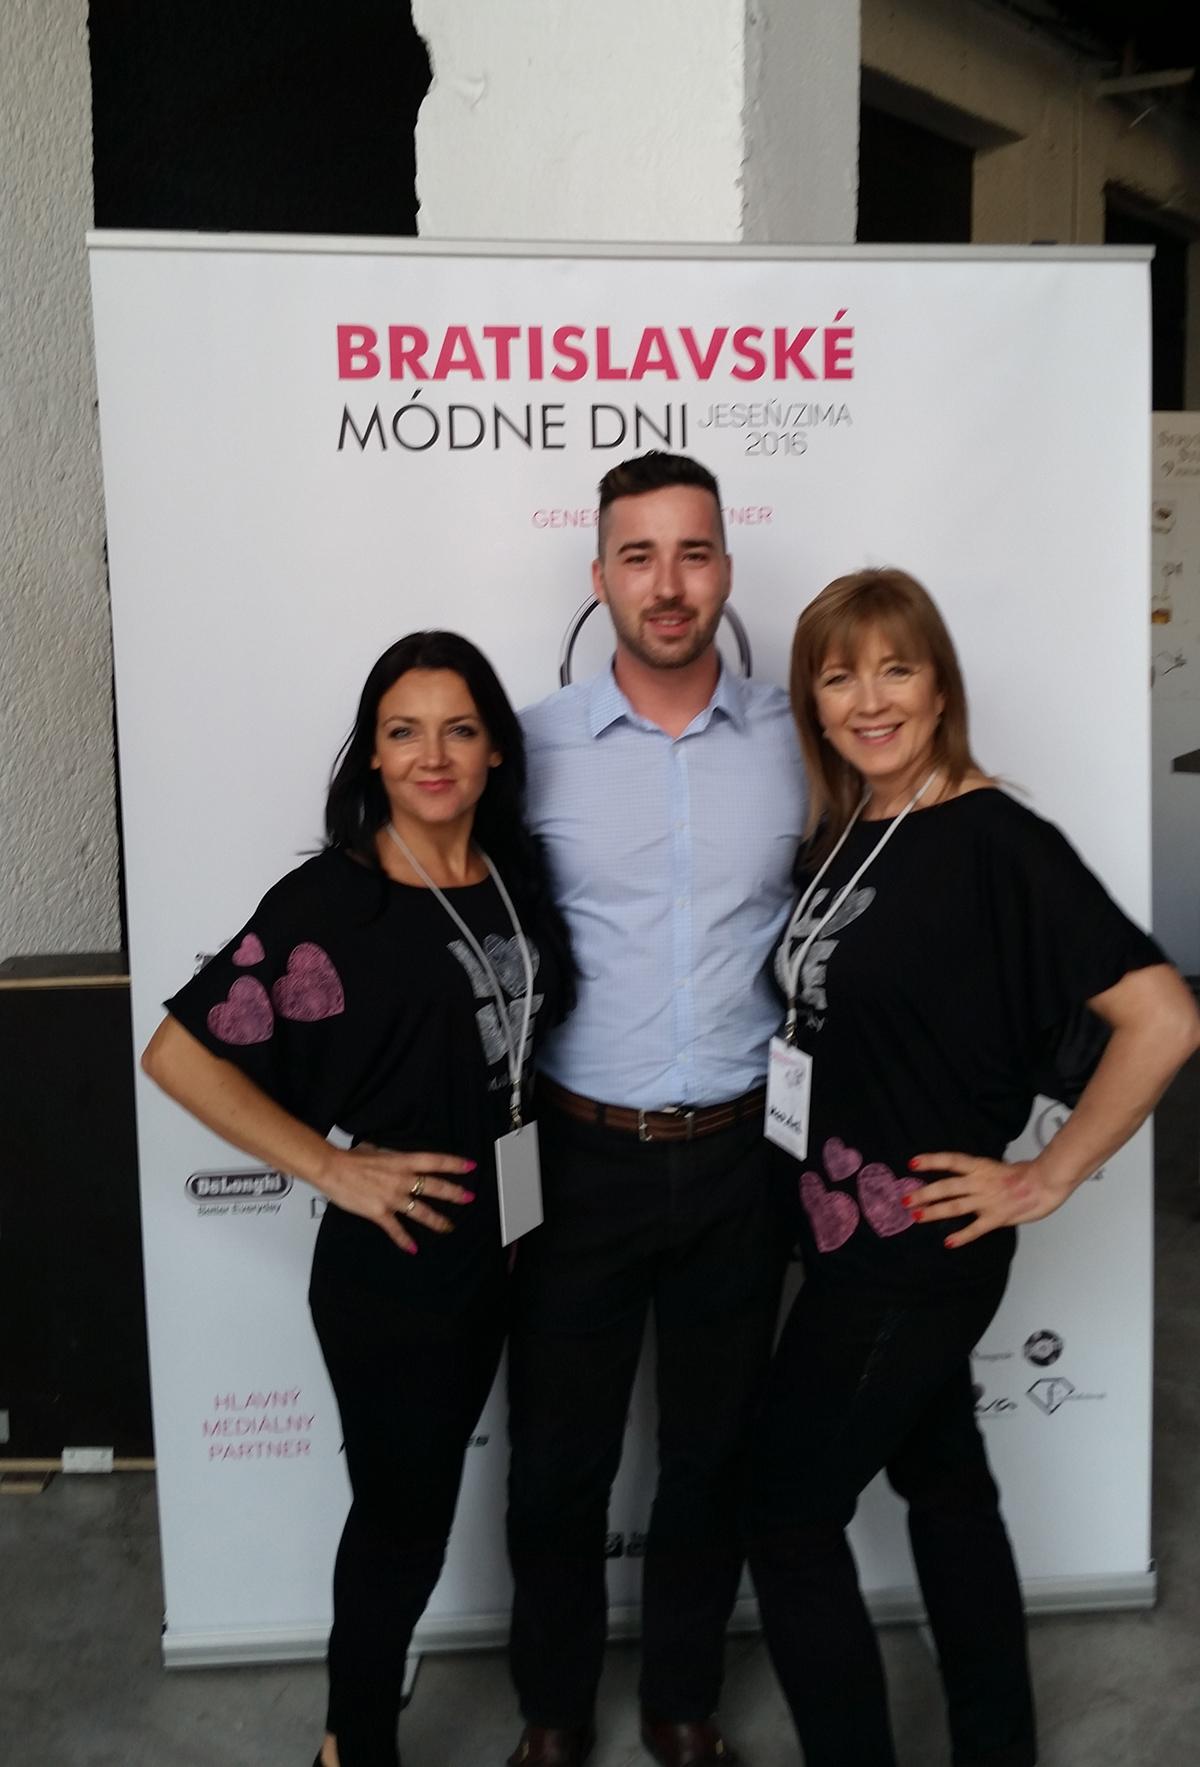 Bratislavské módne dni líčenia Marika Kadučáková